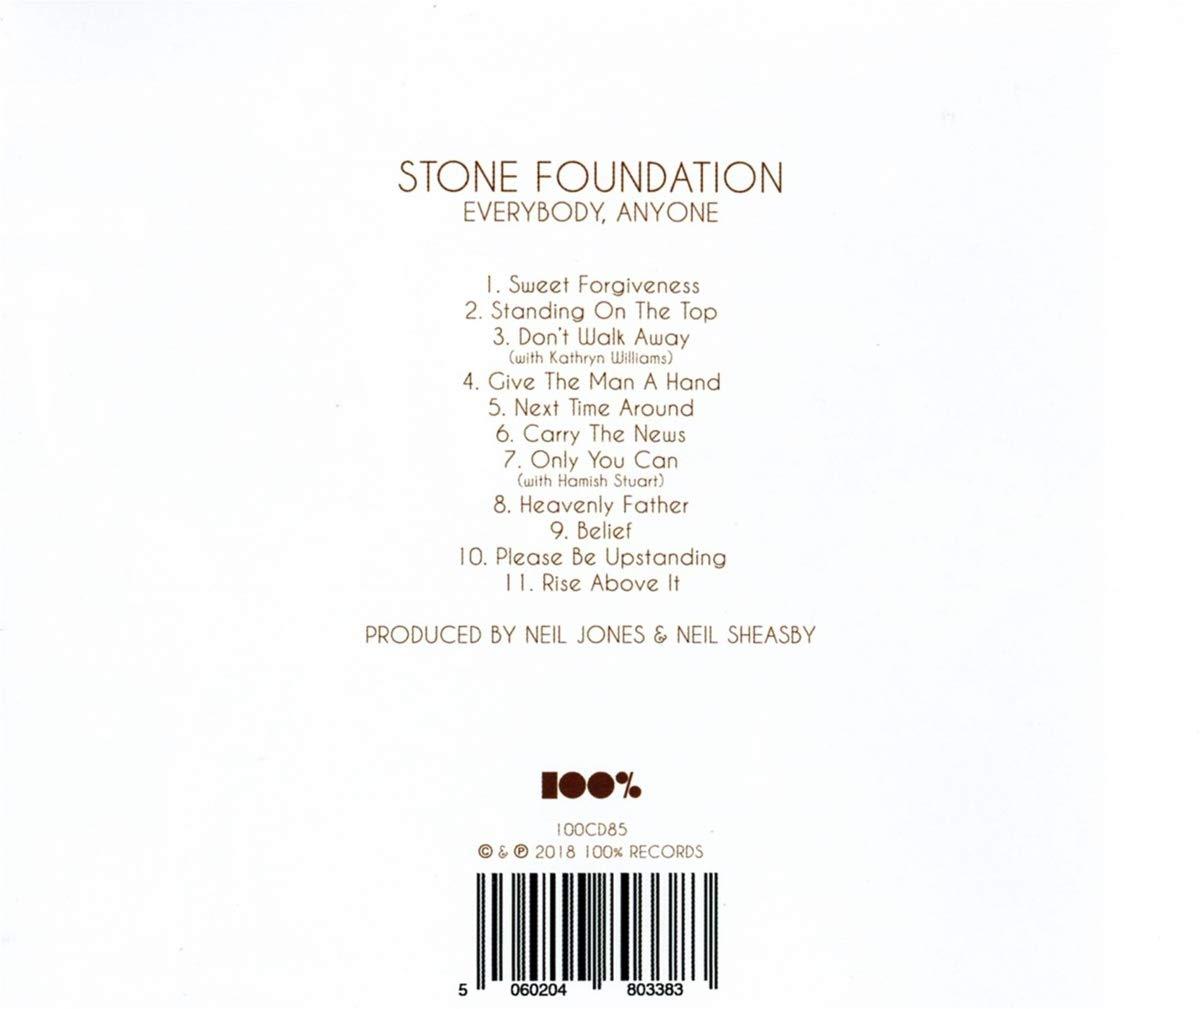 amazon everybody anyone stone foundation 輸入盤 音楽